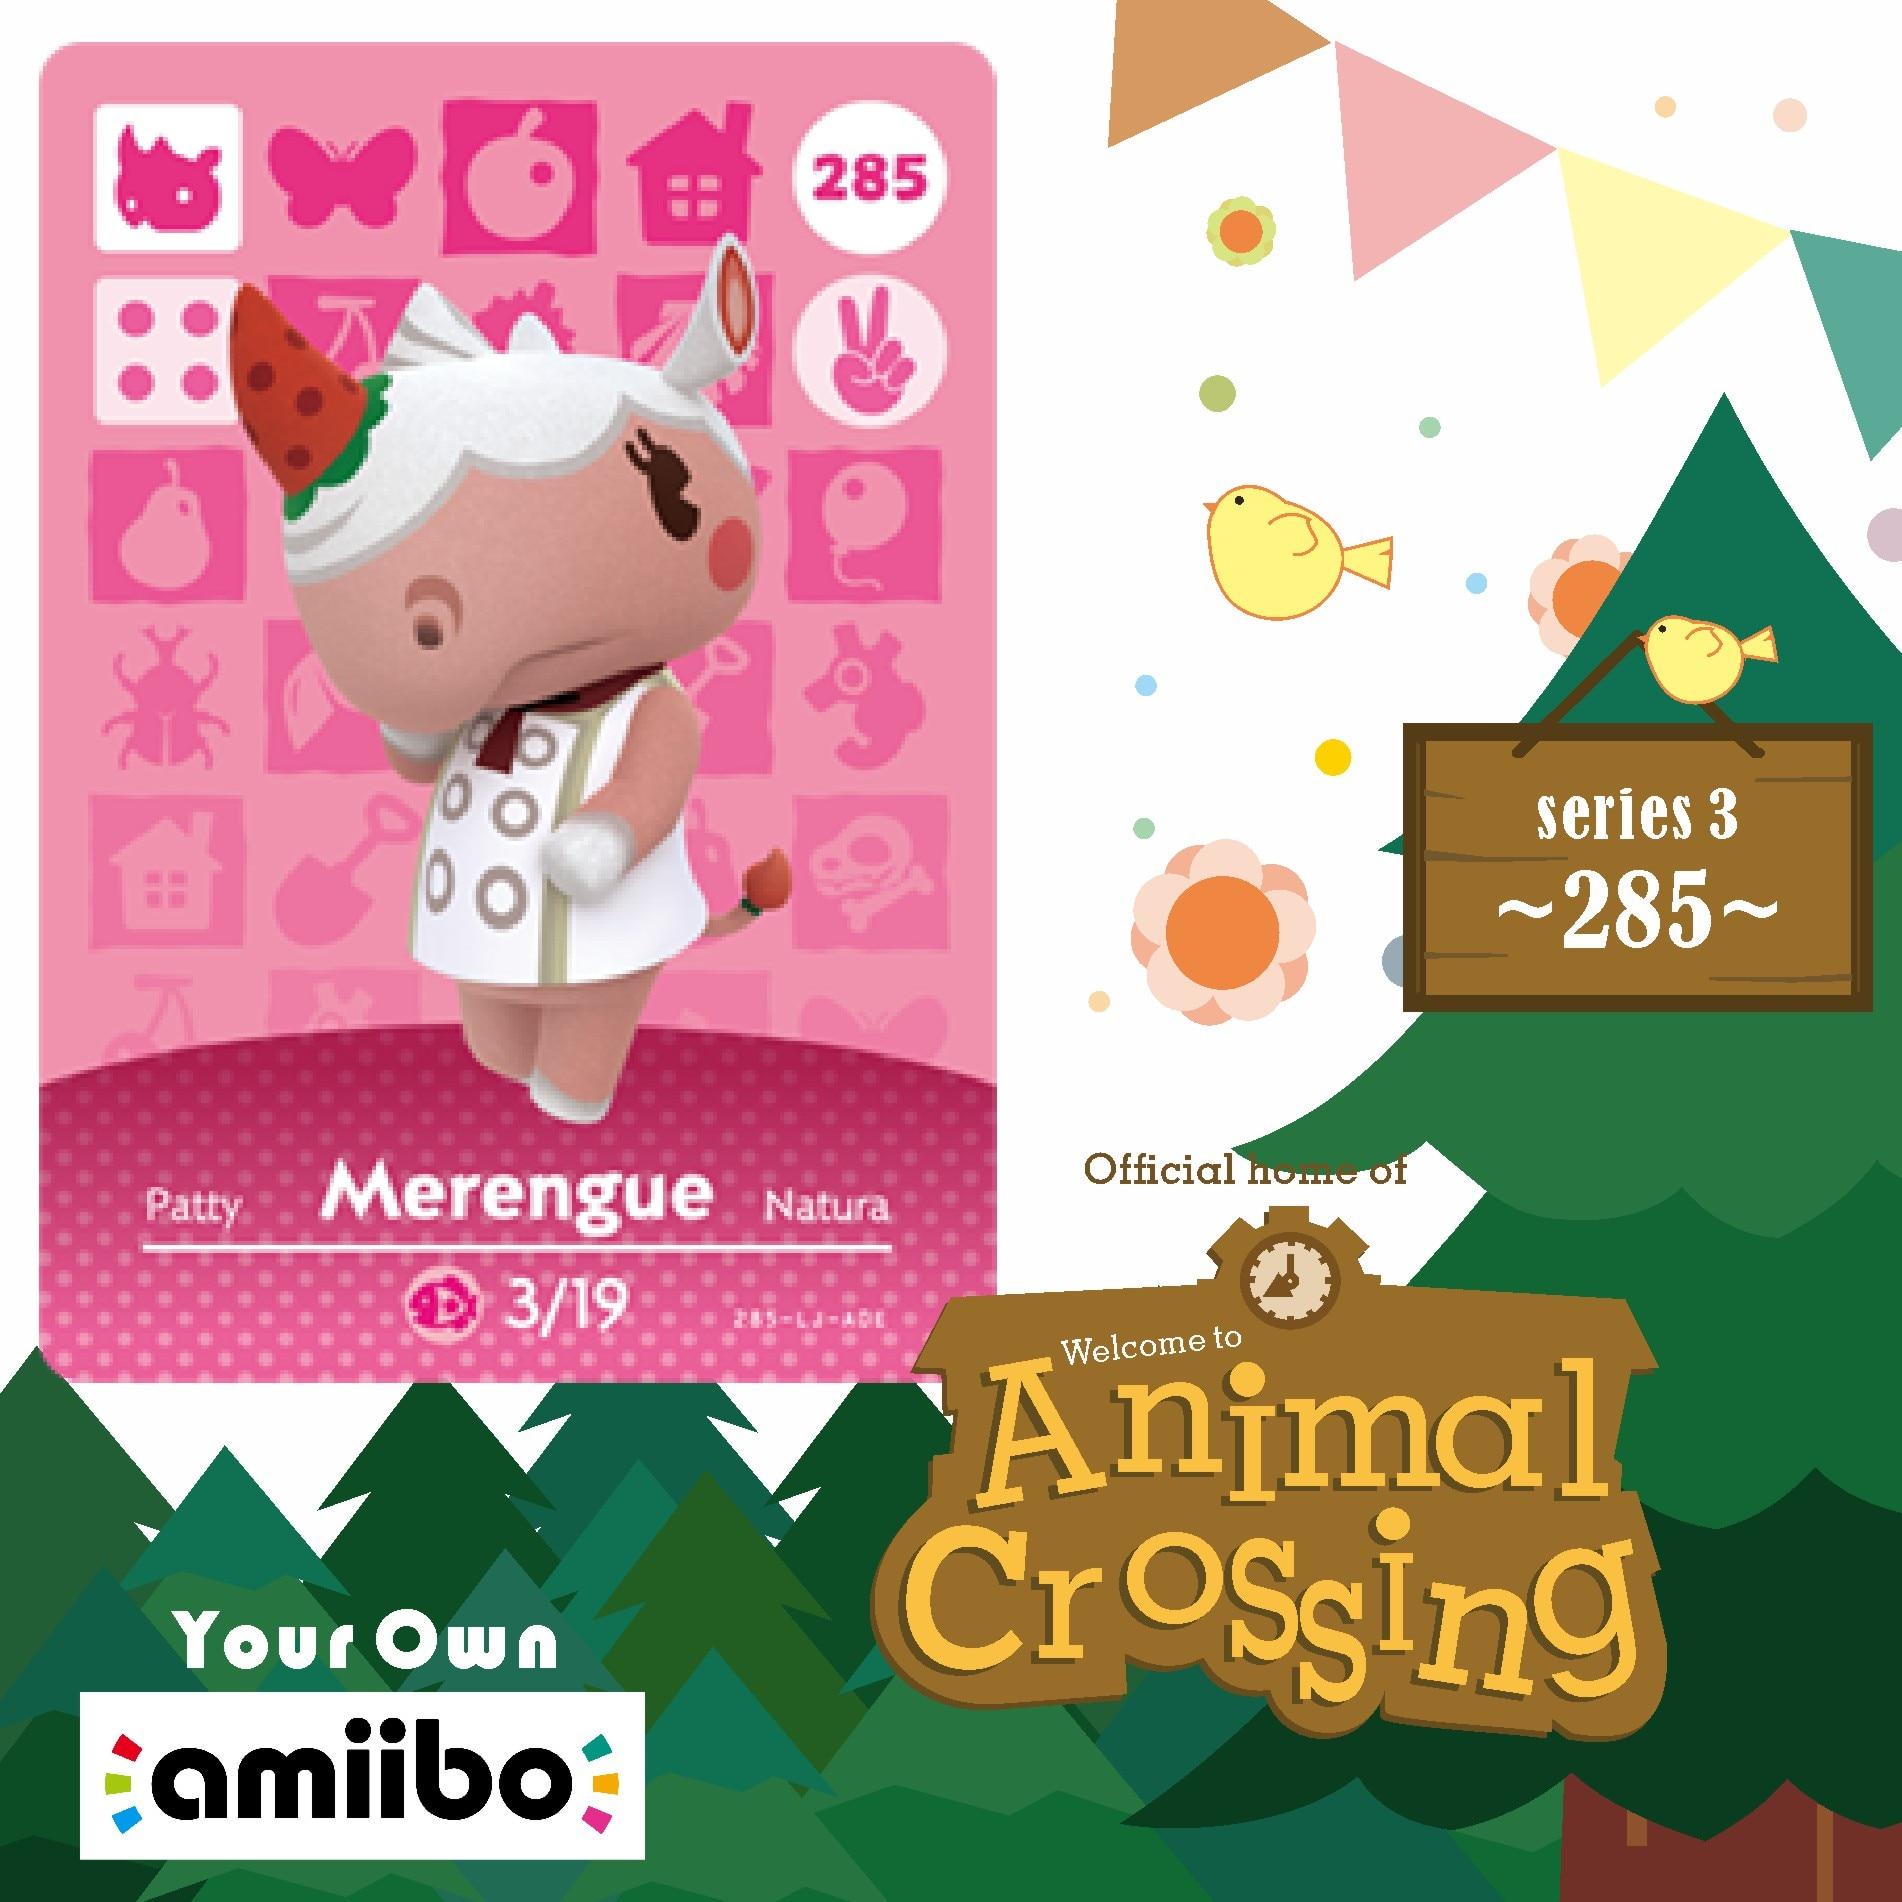 285 Animal Crossing Merengue Amiibo Merengue Animal Crossing Amiibo Merengue Animal Crossing Merengue Amiibo Merengue Cards 285